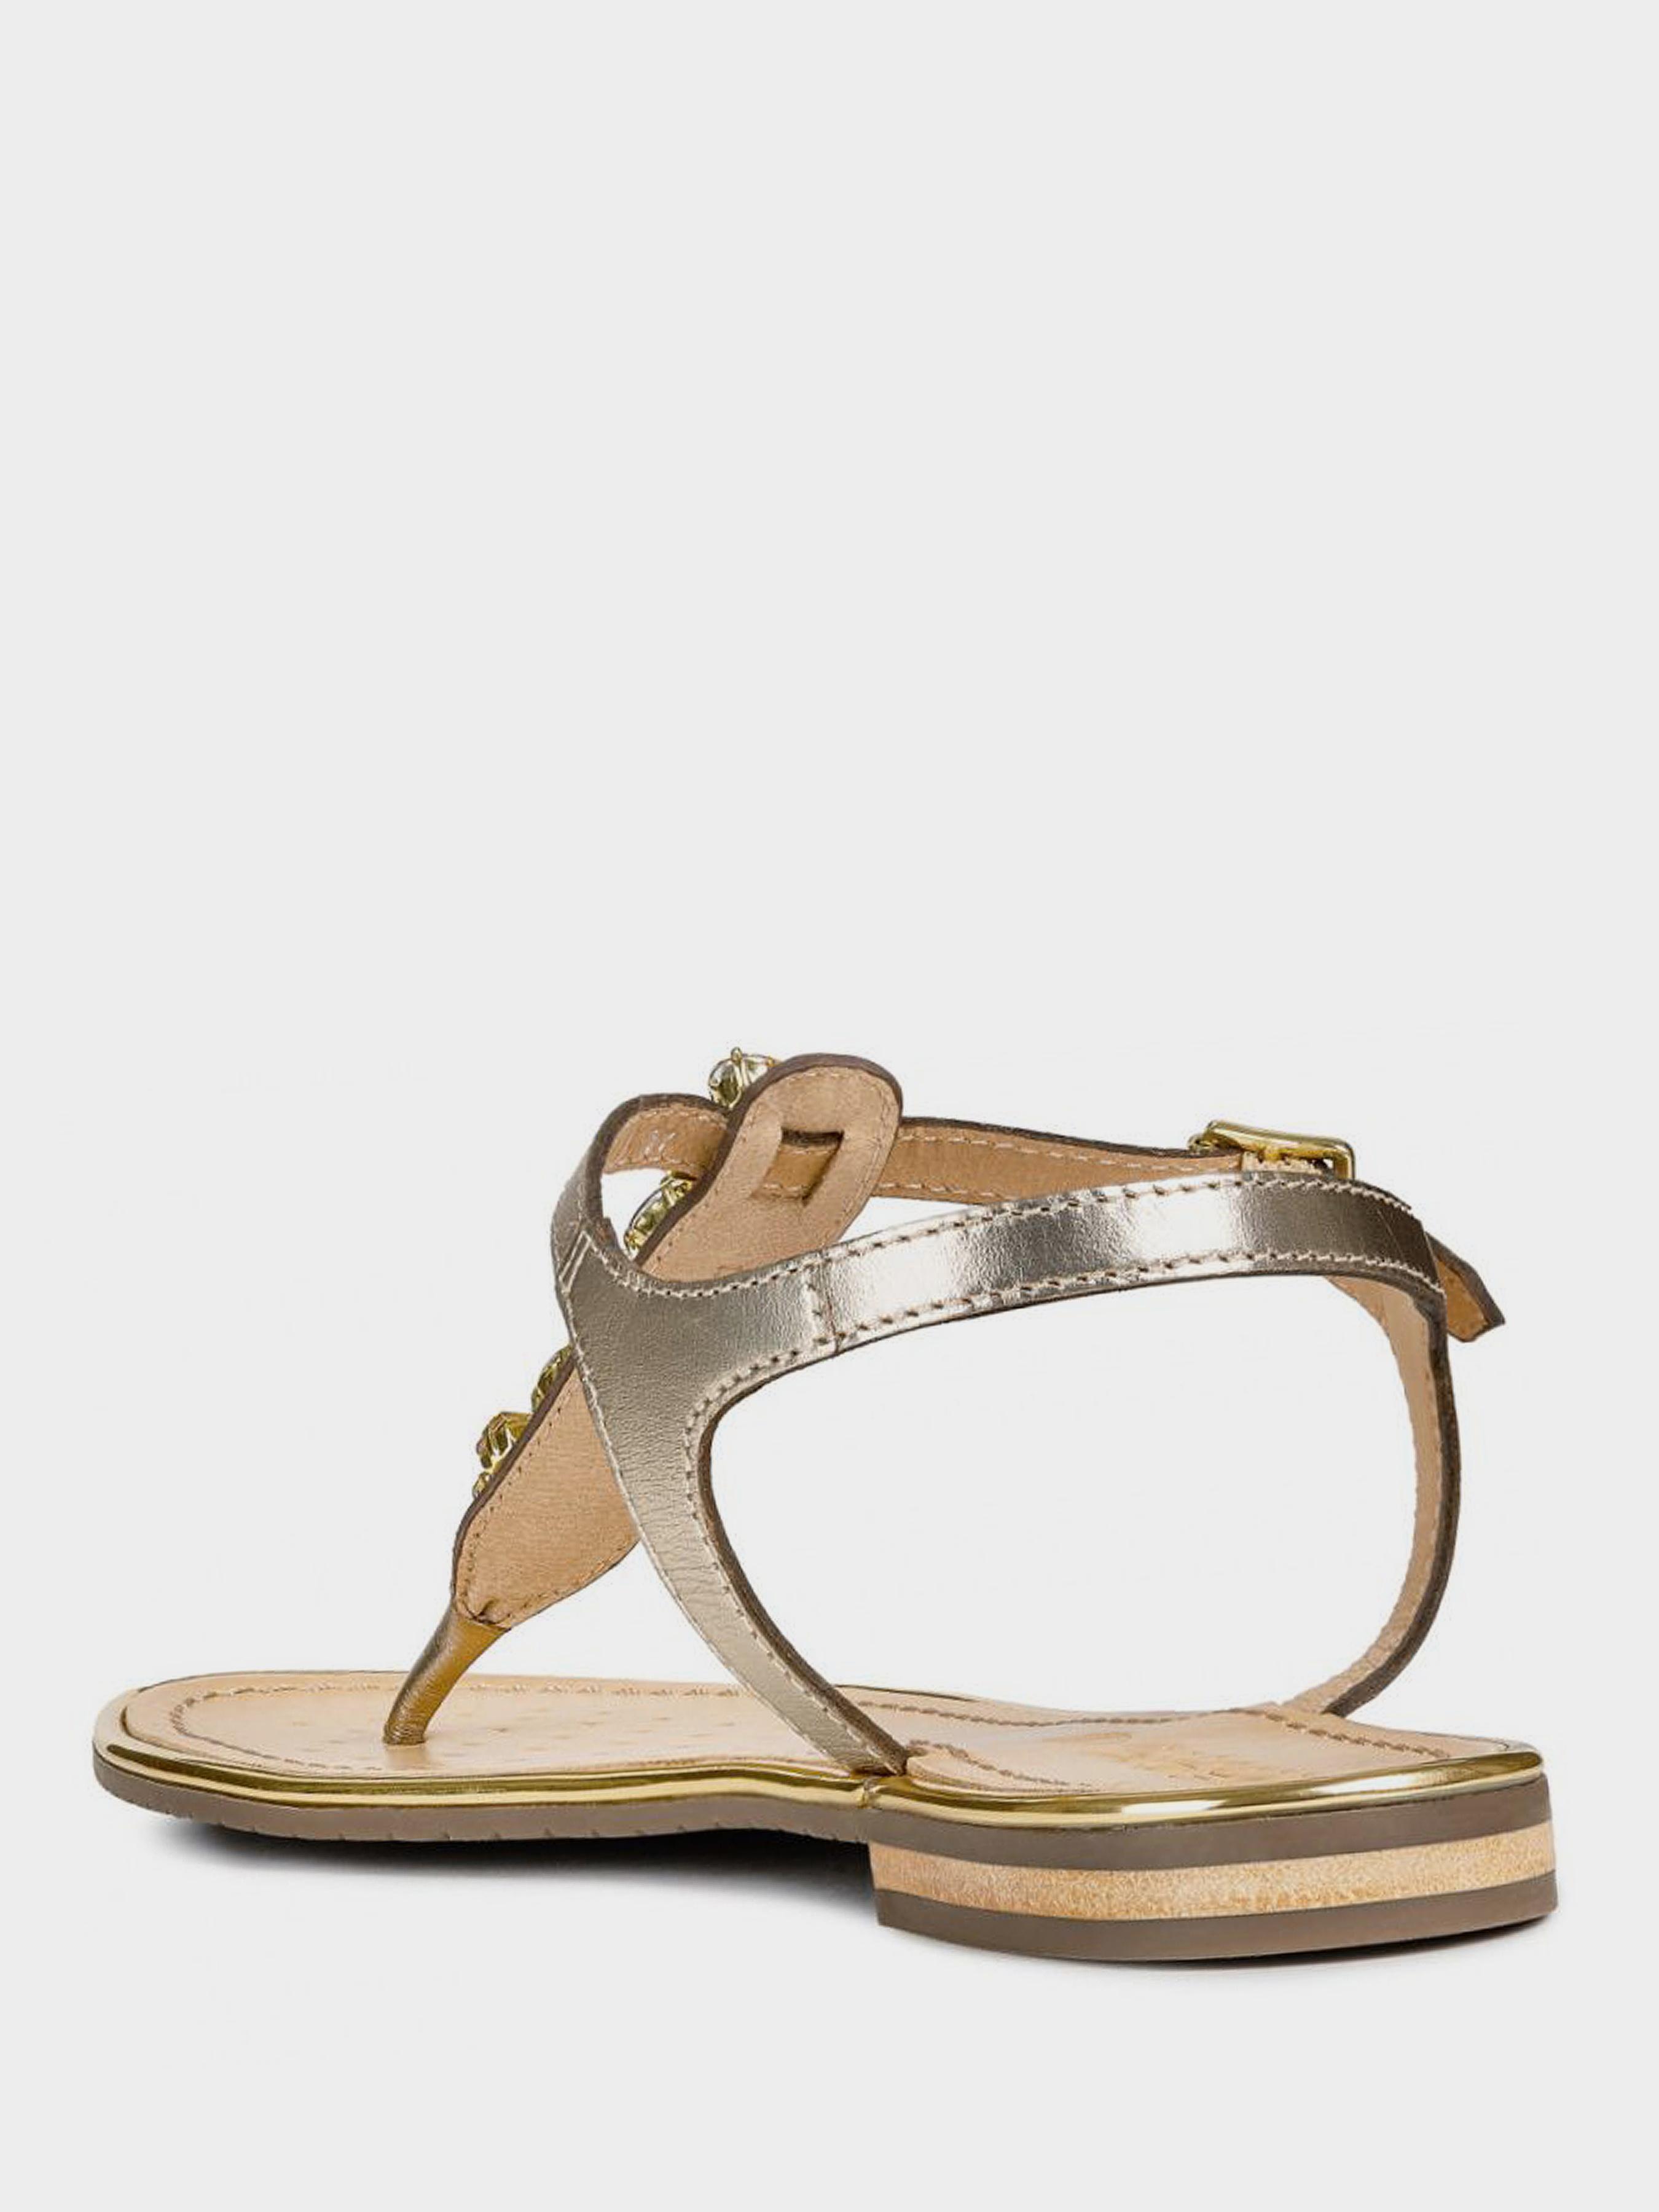 Сандалии женские Geox D SOZY PLUS XW3592 размеры обуви, 2017